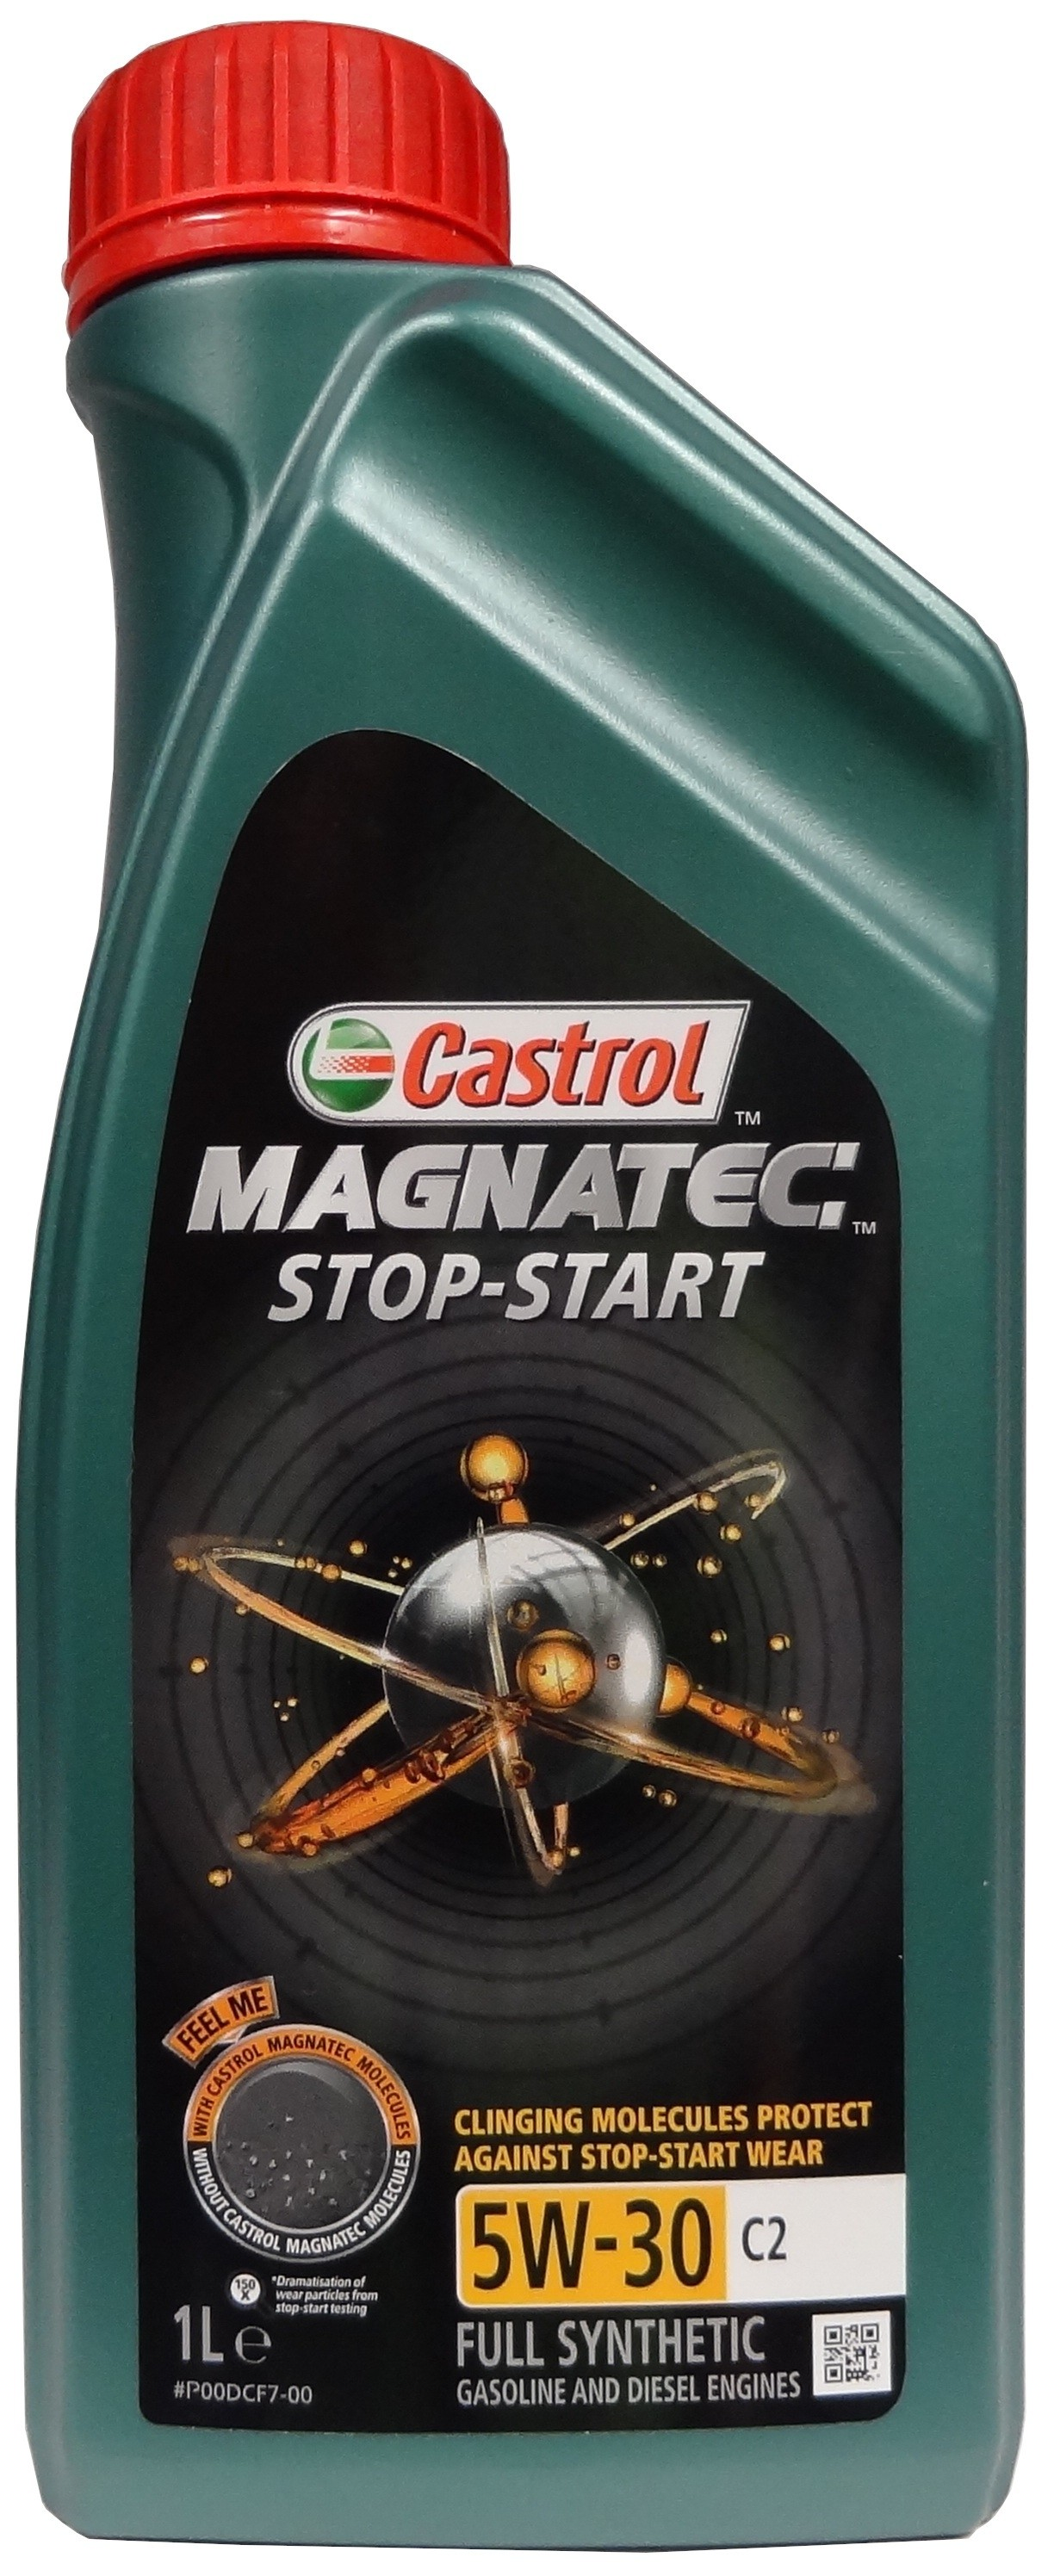 CASTROL Magnatec 5W-30 C2 Stop-Start 1L